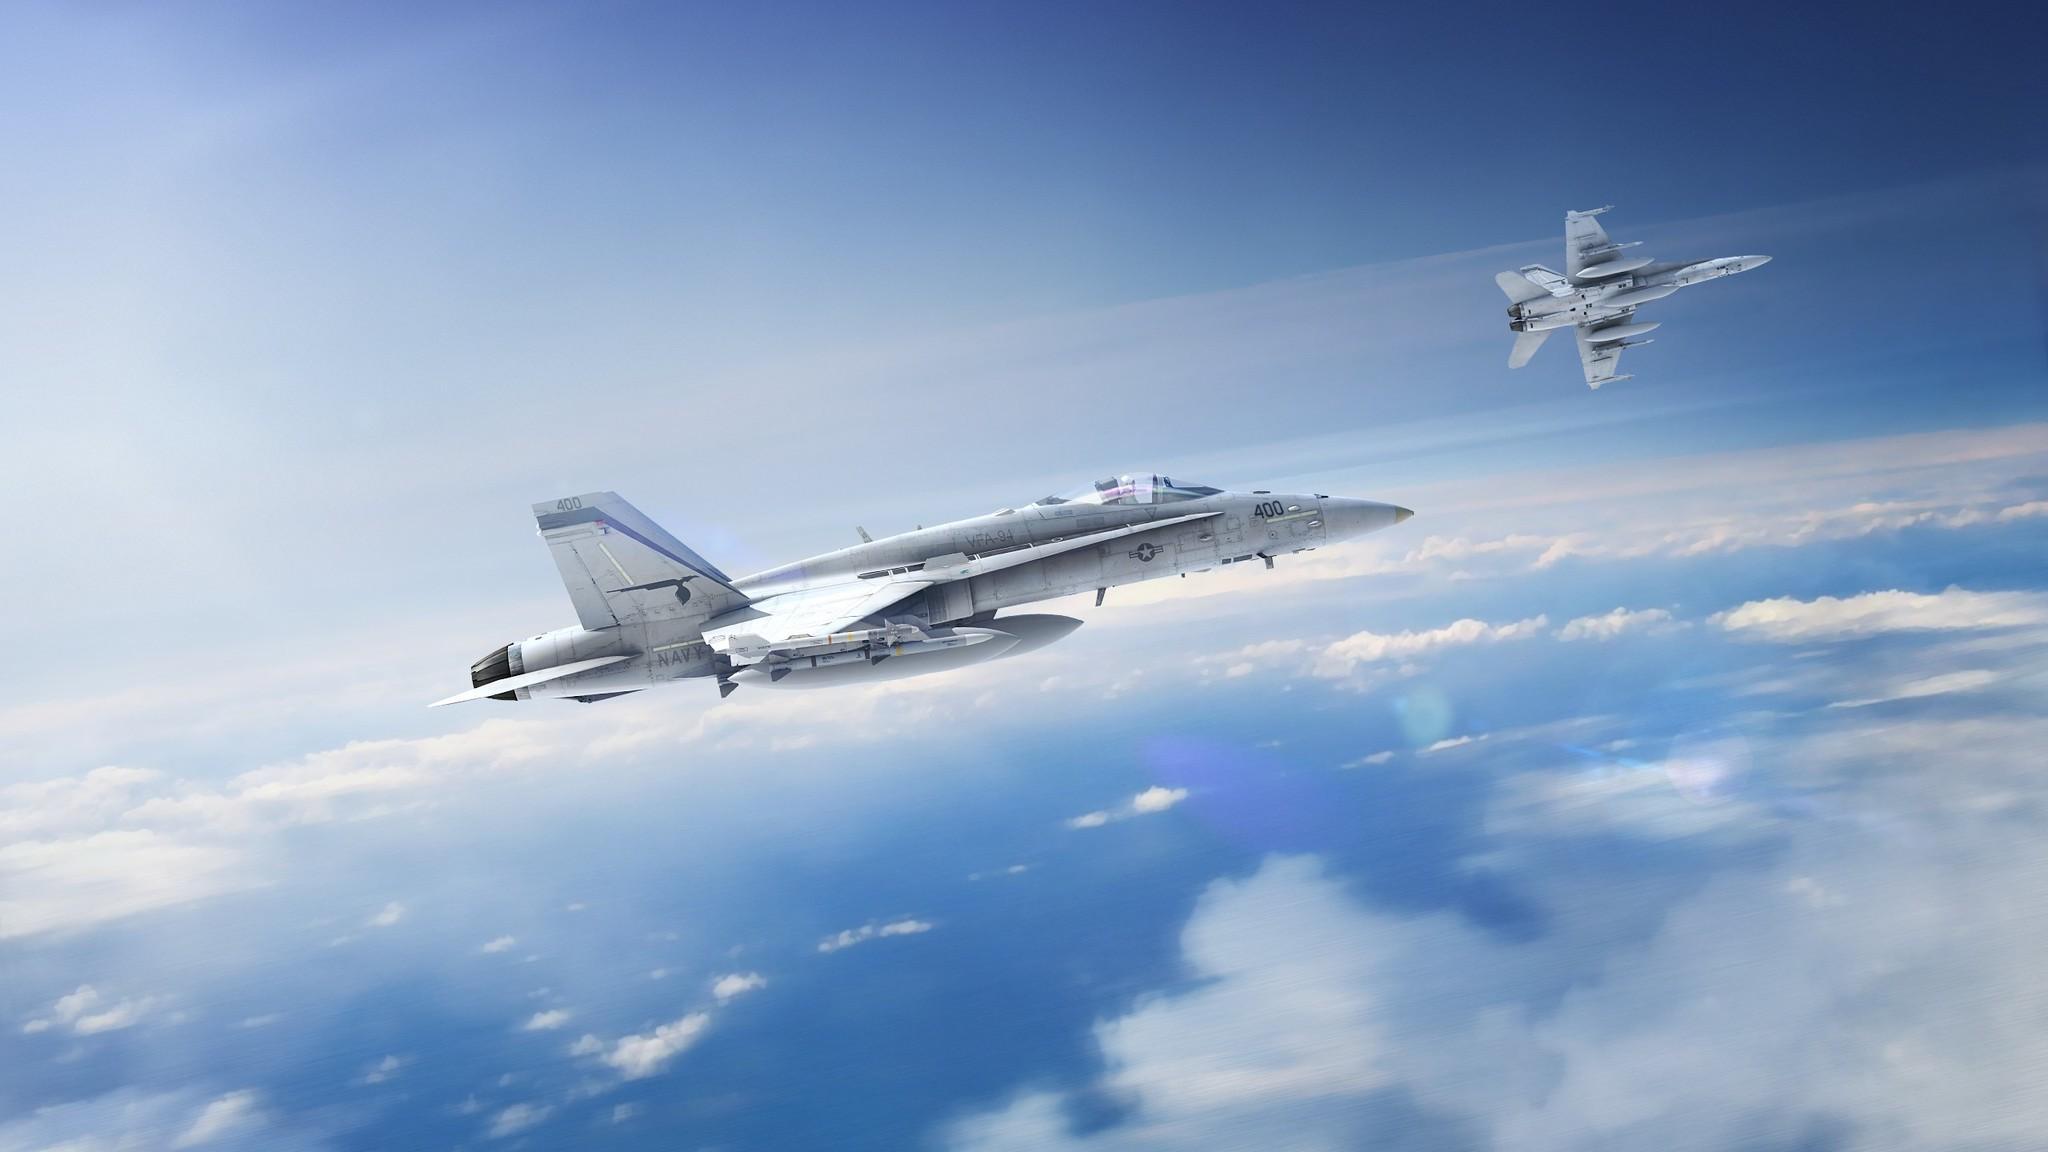 Res: 2048x1152, Dcs World Jet Sound Mod 100